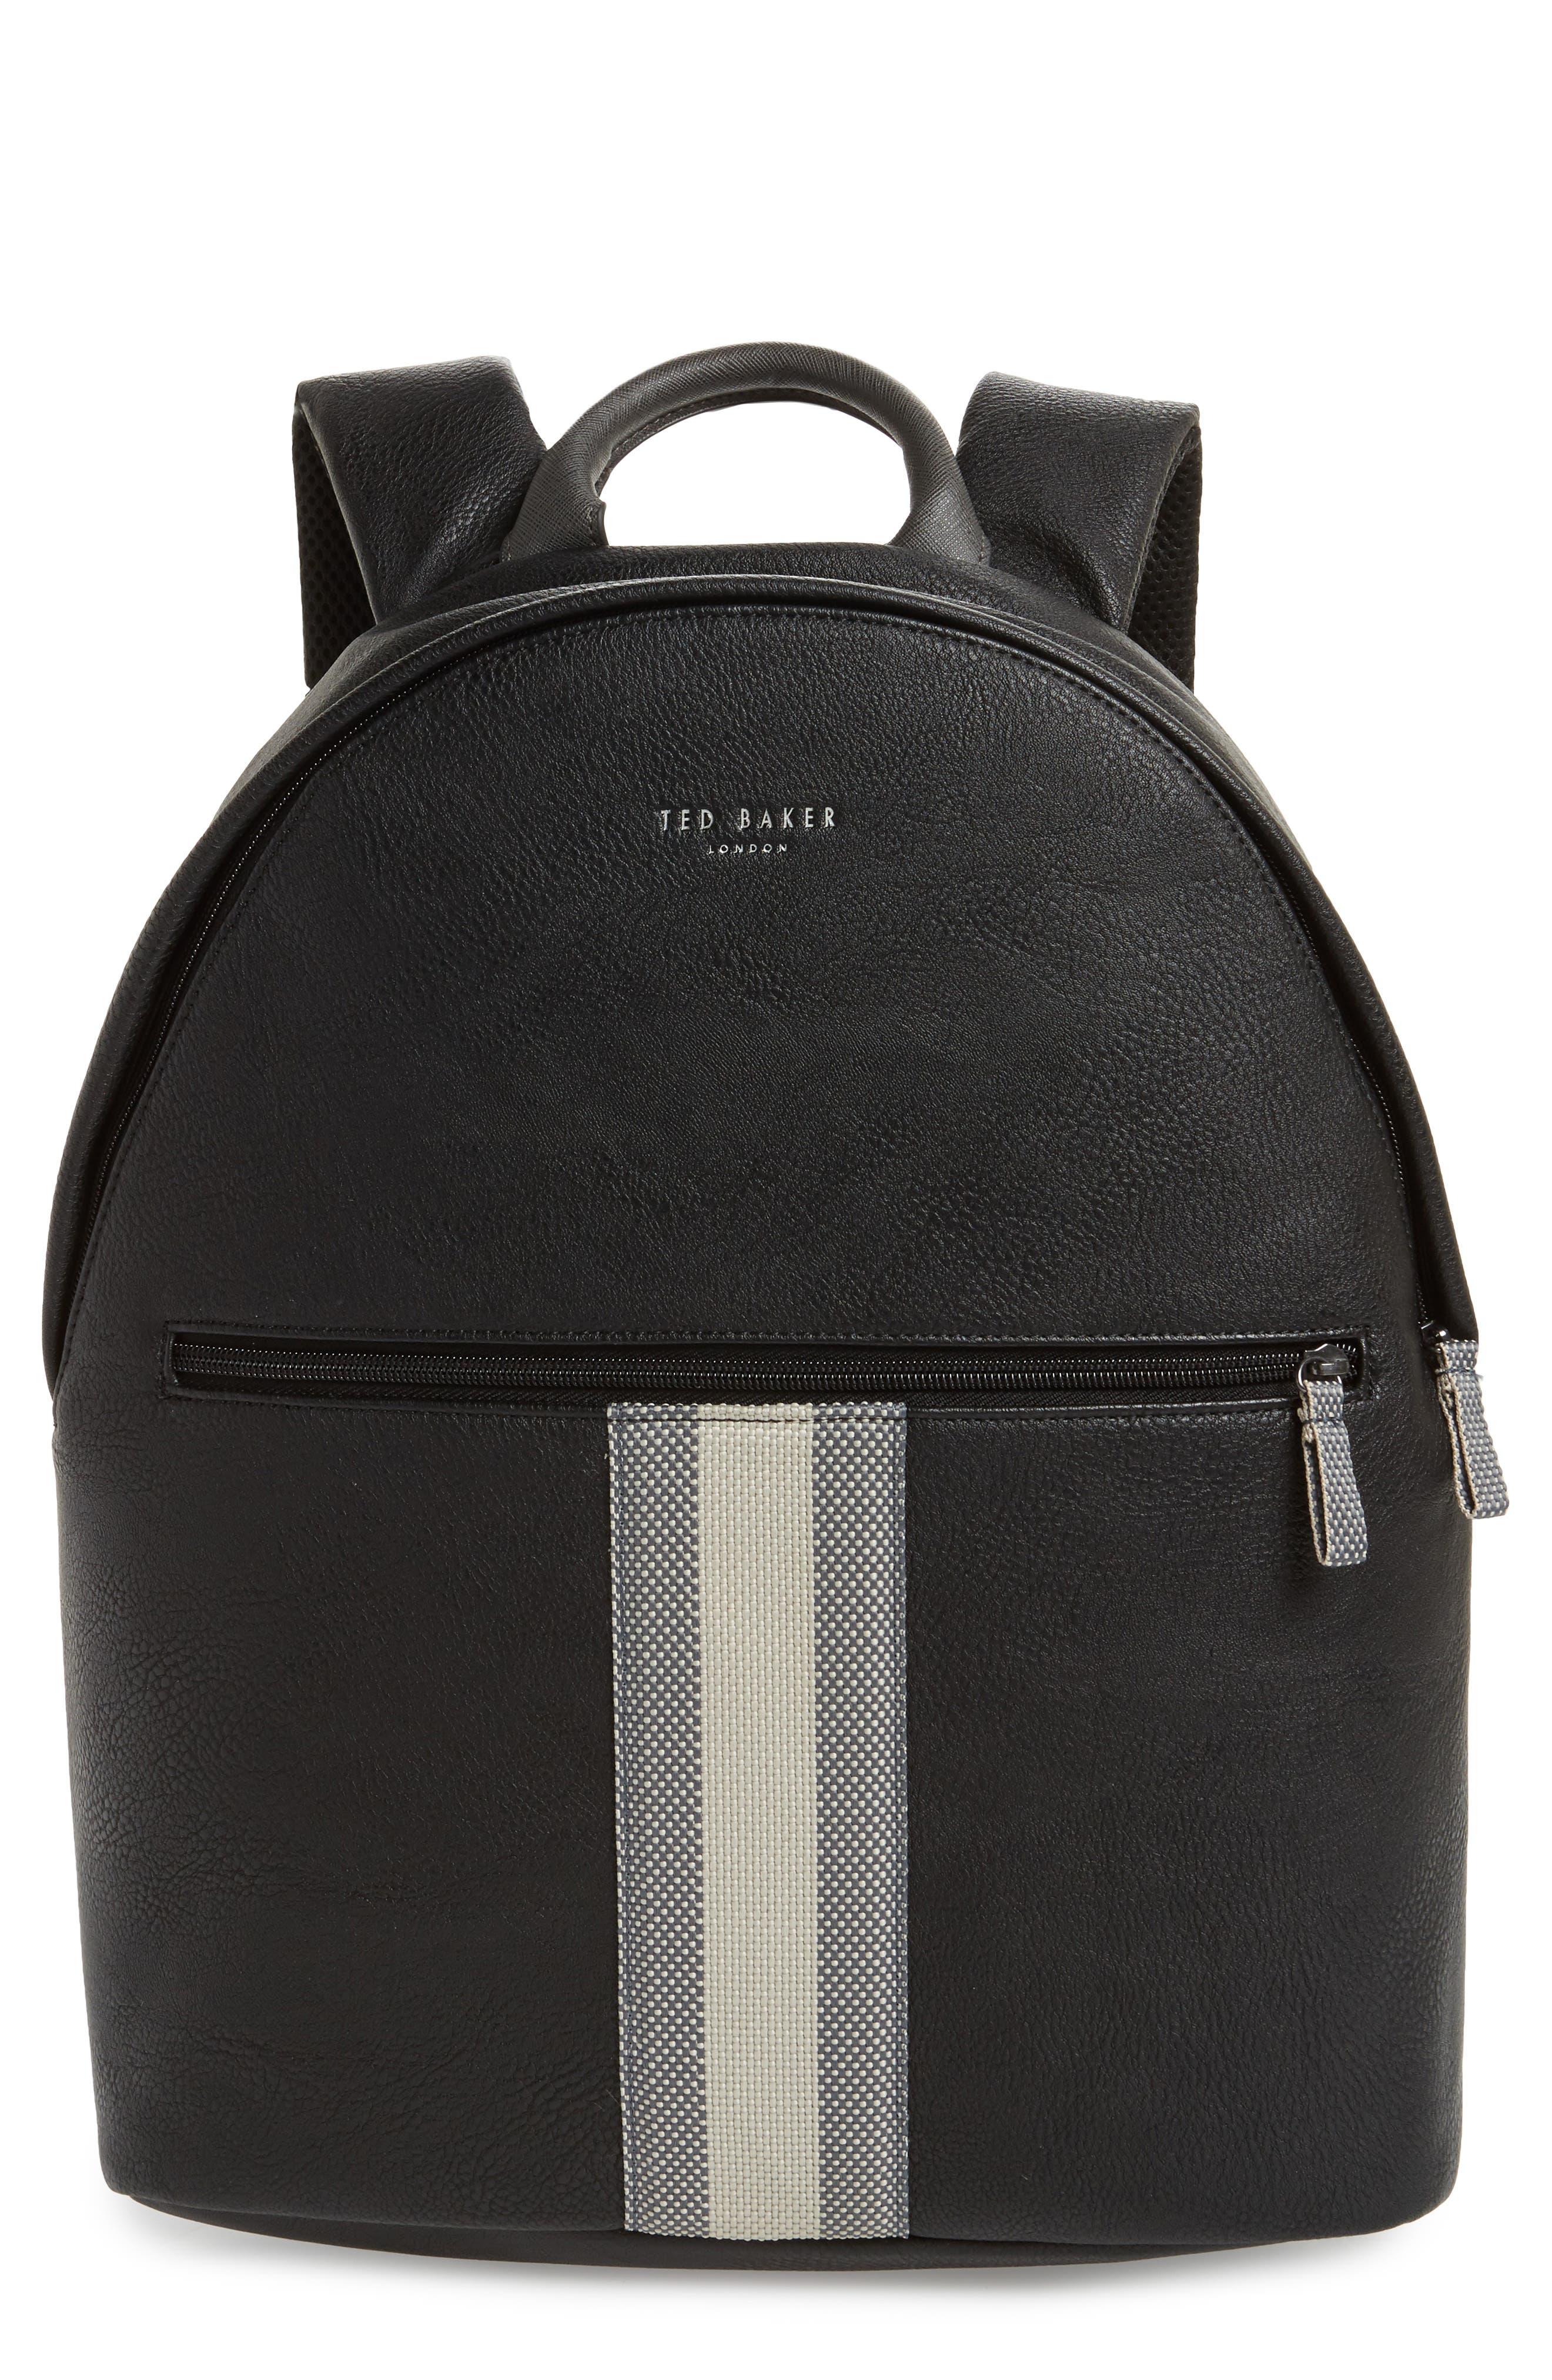 Ted Baker London Royale Backpack